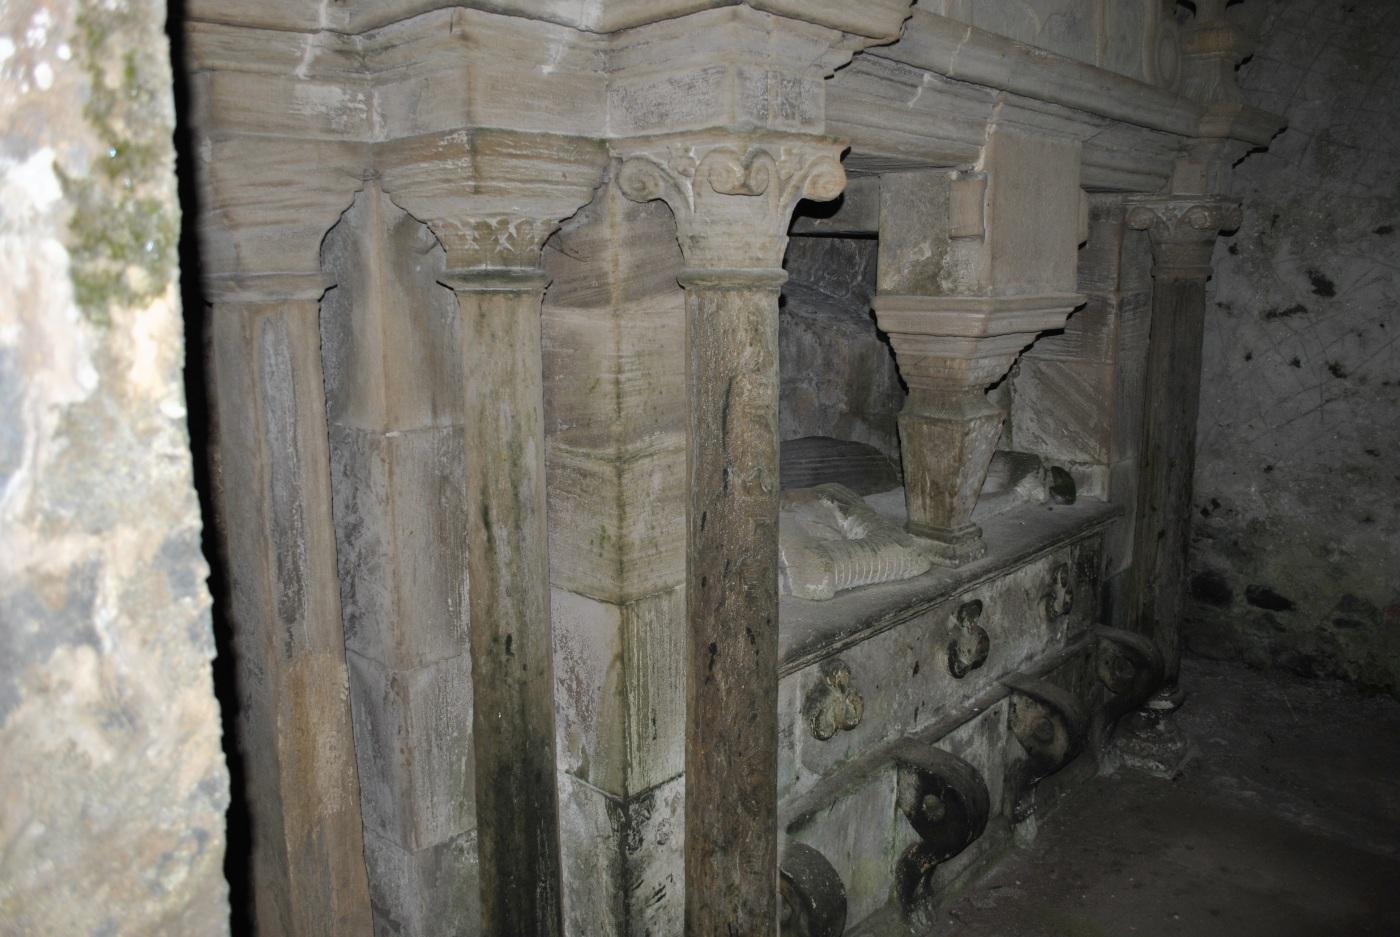 inside Ballantrae mausoleum